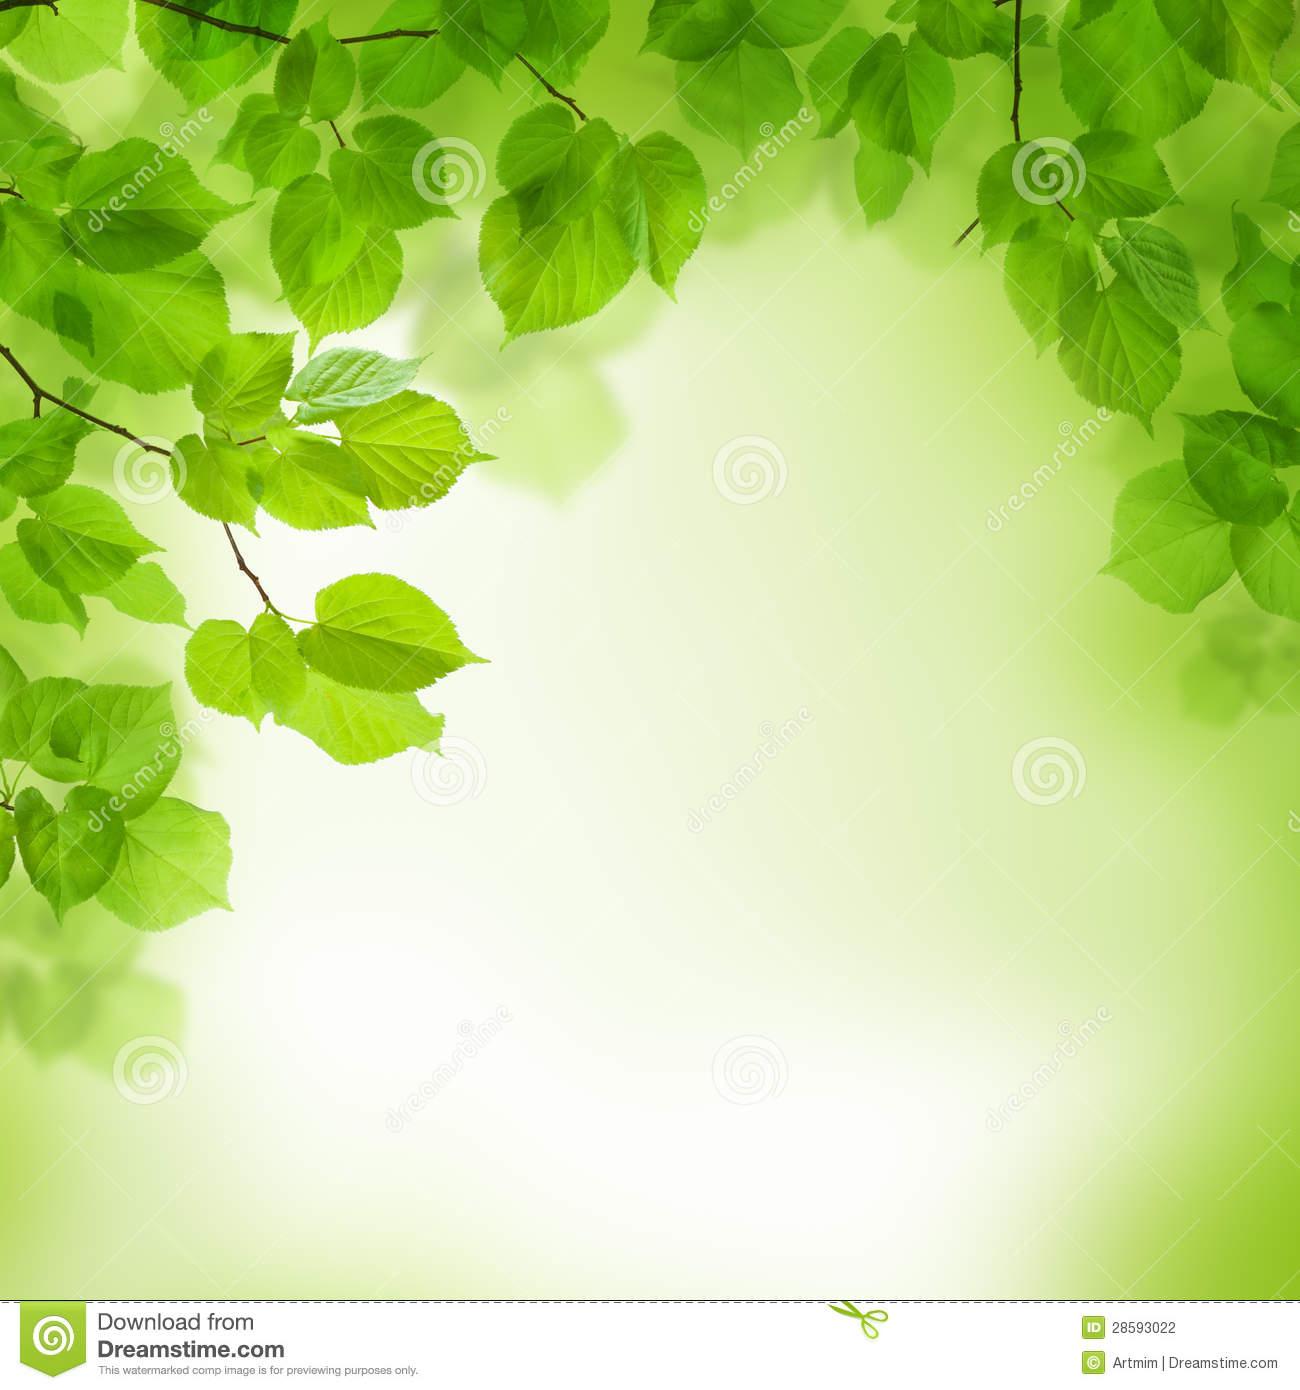 Green Leaf Wallpaper Border HD Wallpapers on picsfaircom 1300x1390